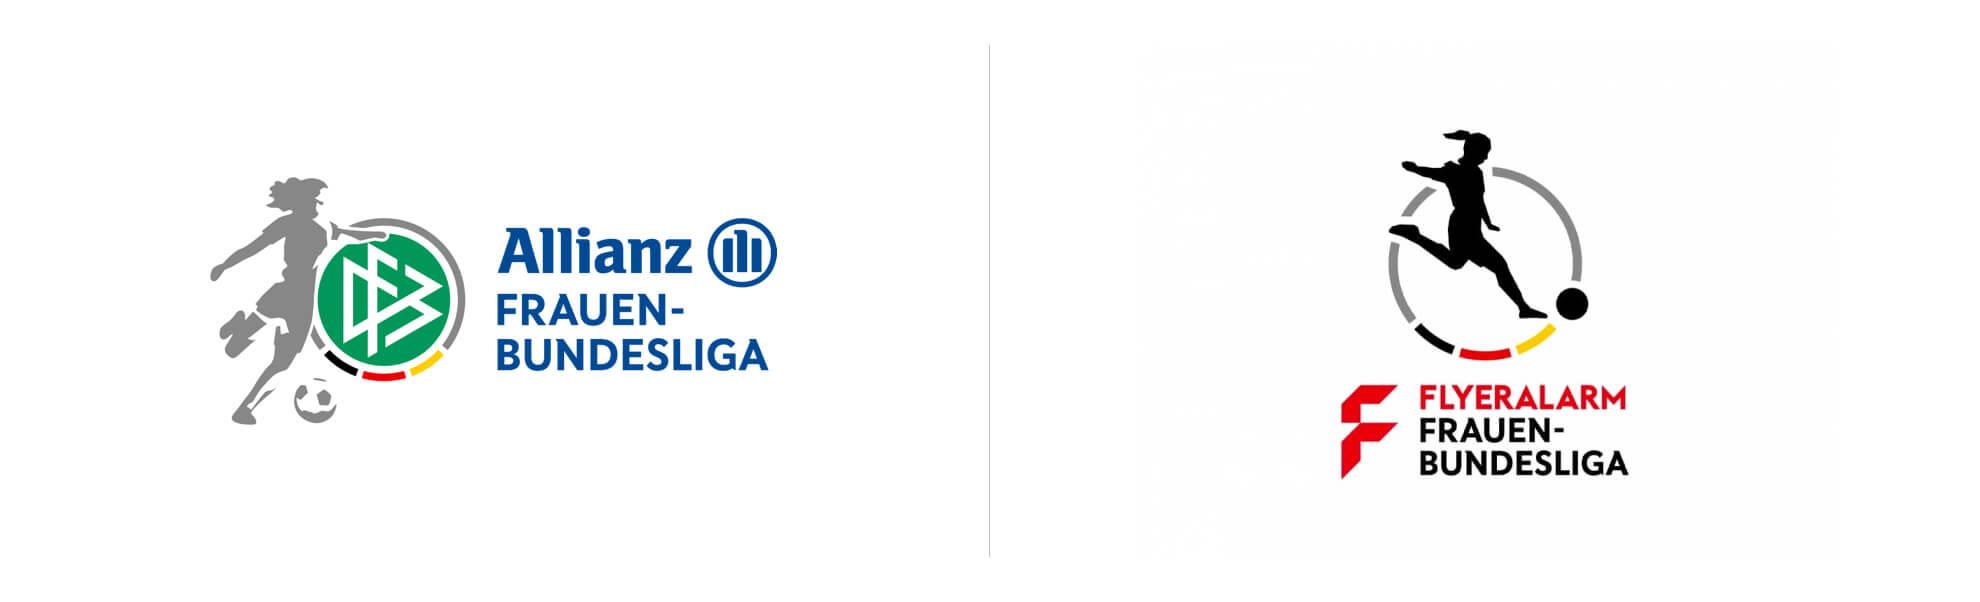 Niemiecka damska bundesliga zmieniła logo